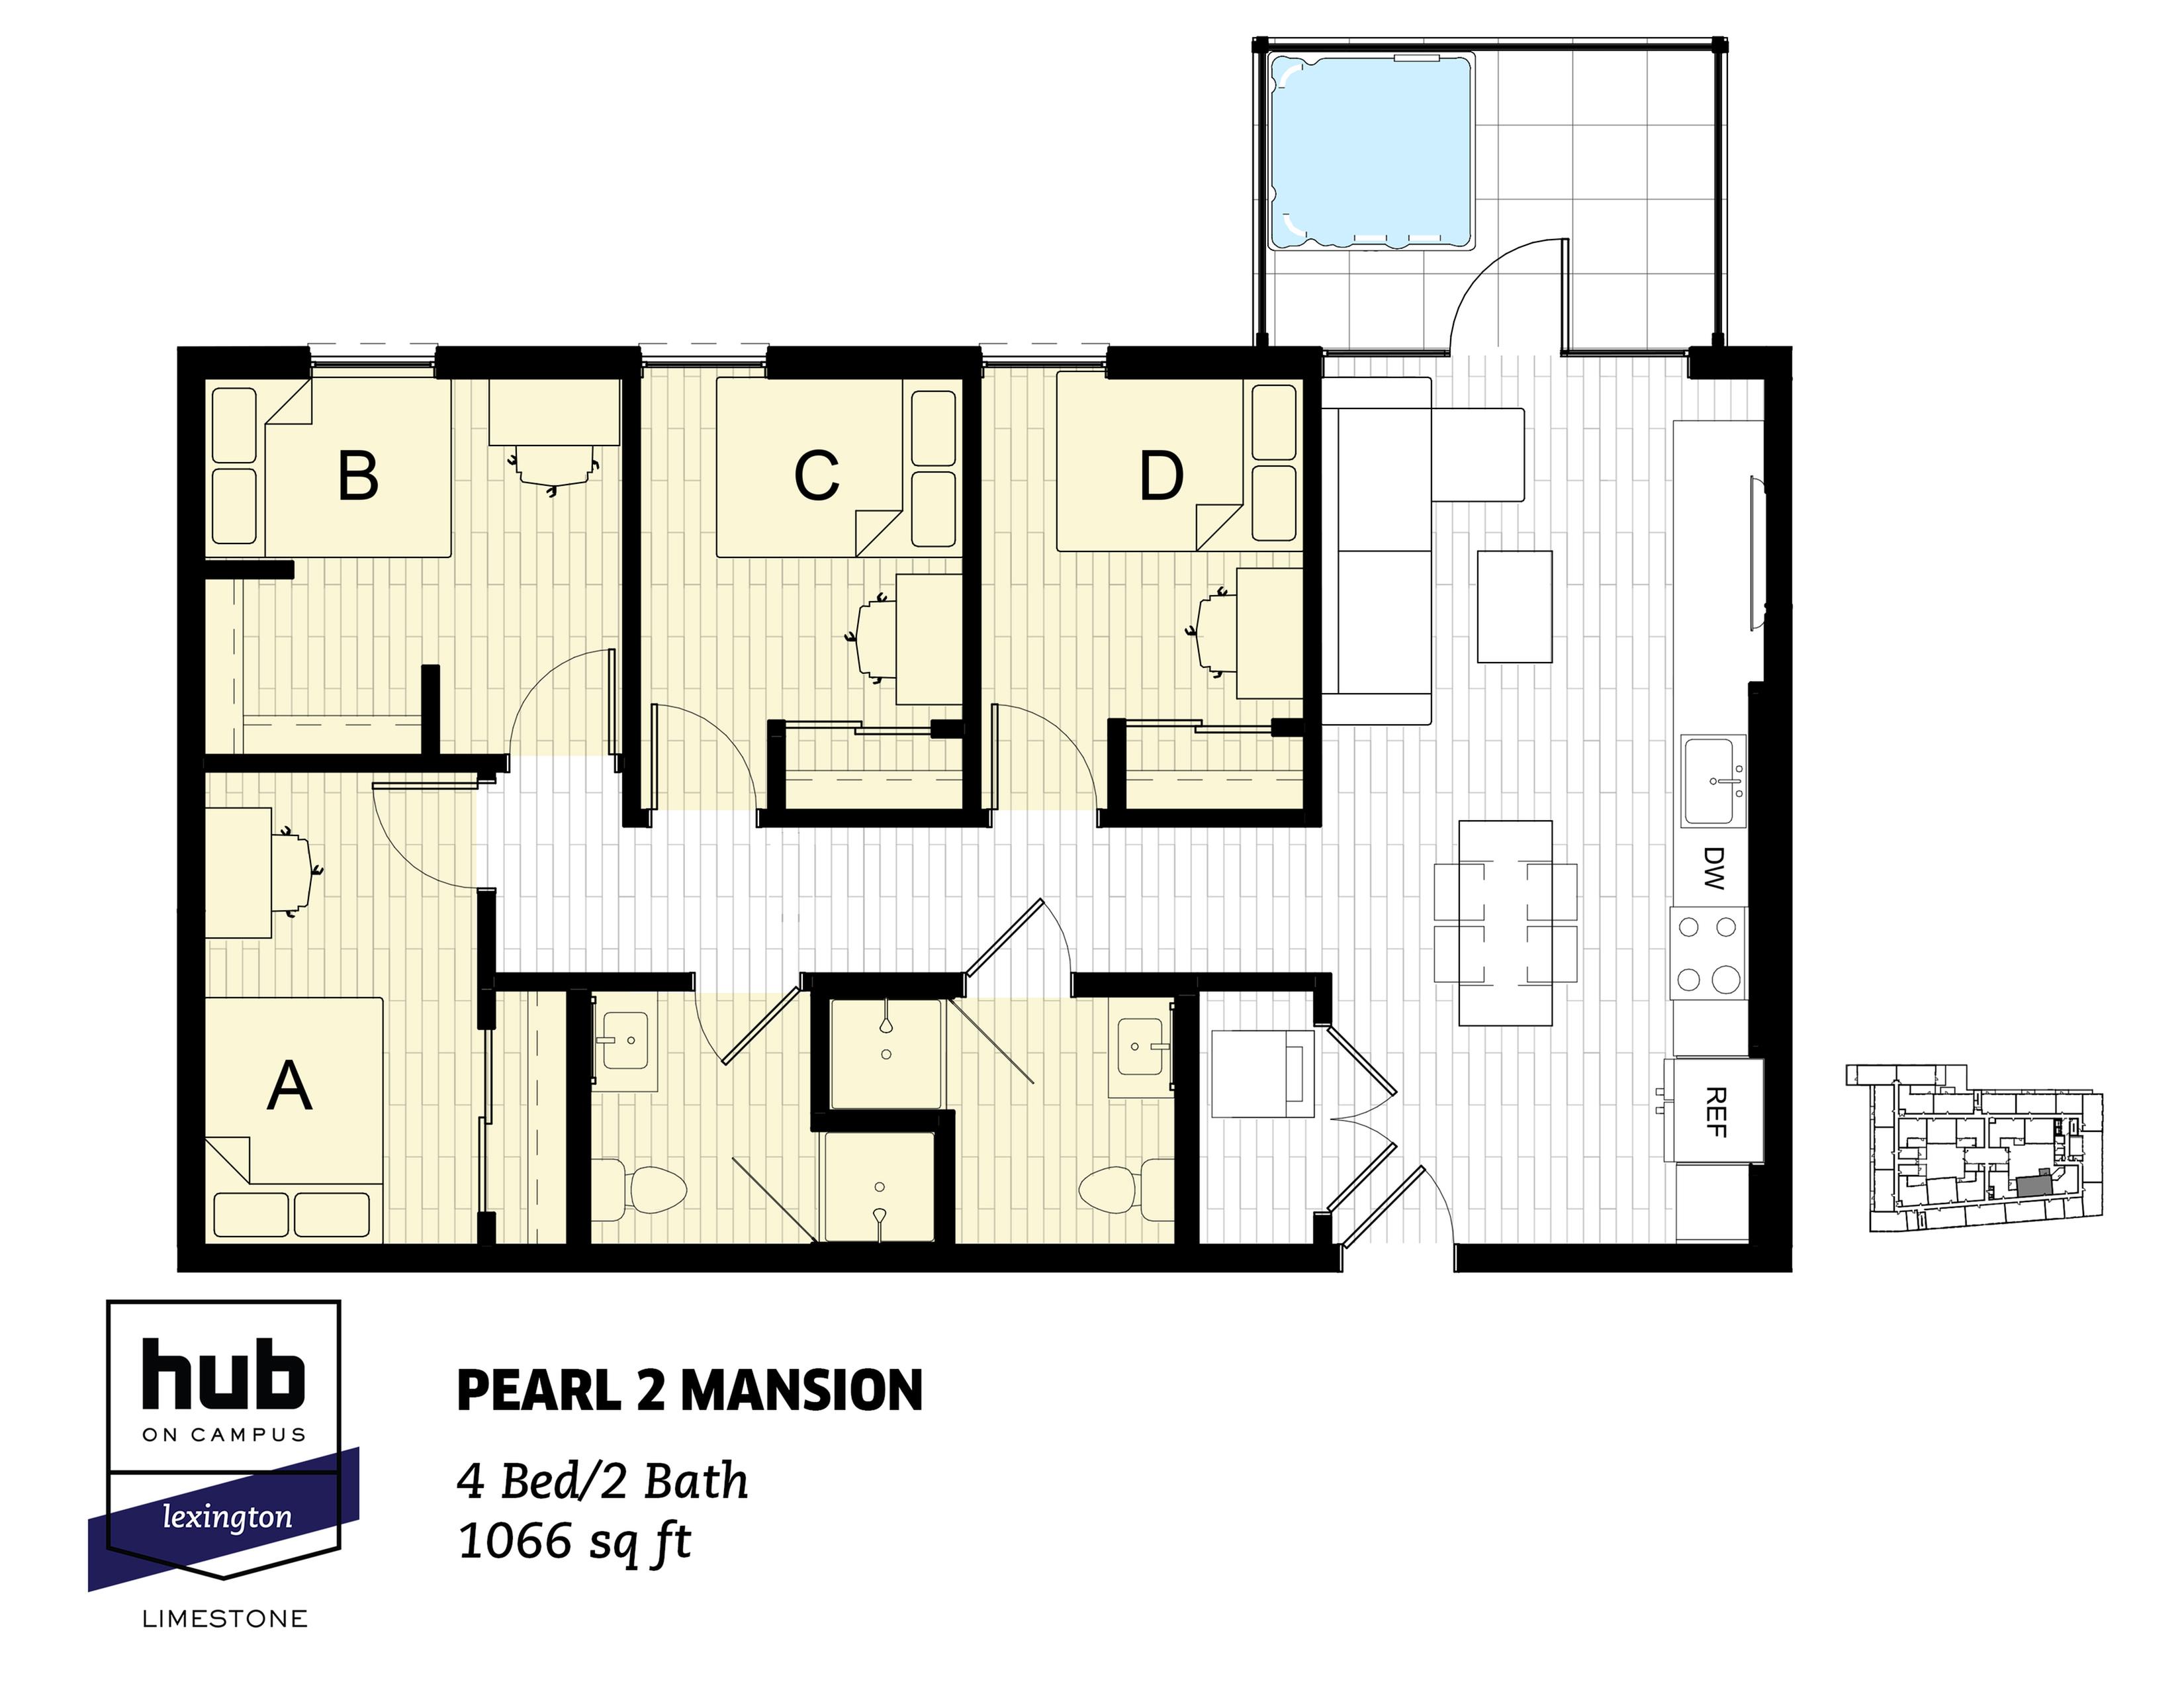 Pearl 2 Mansion